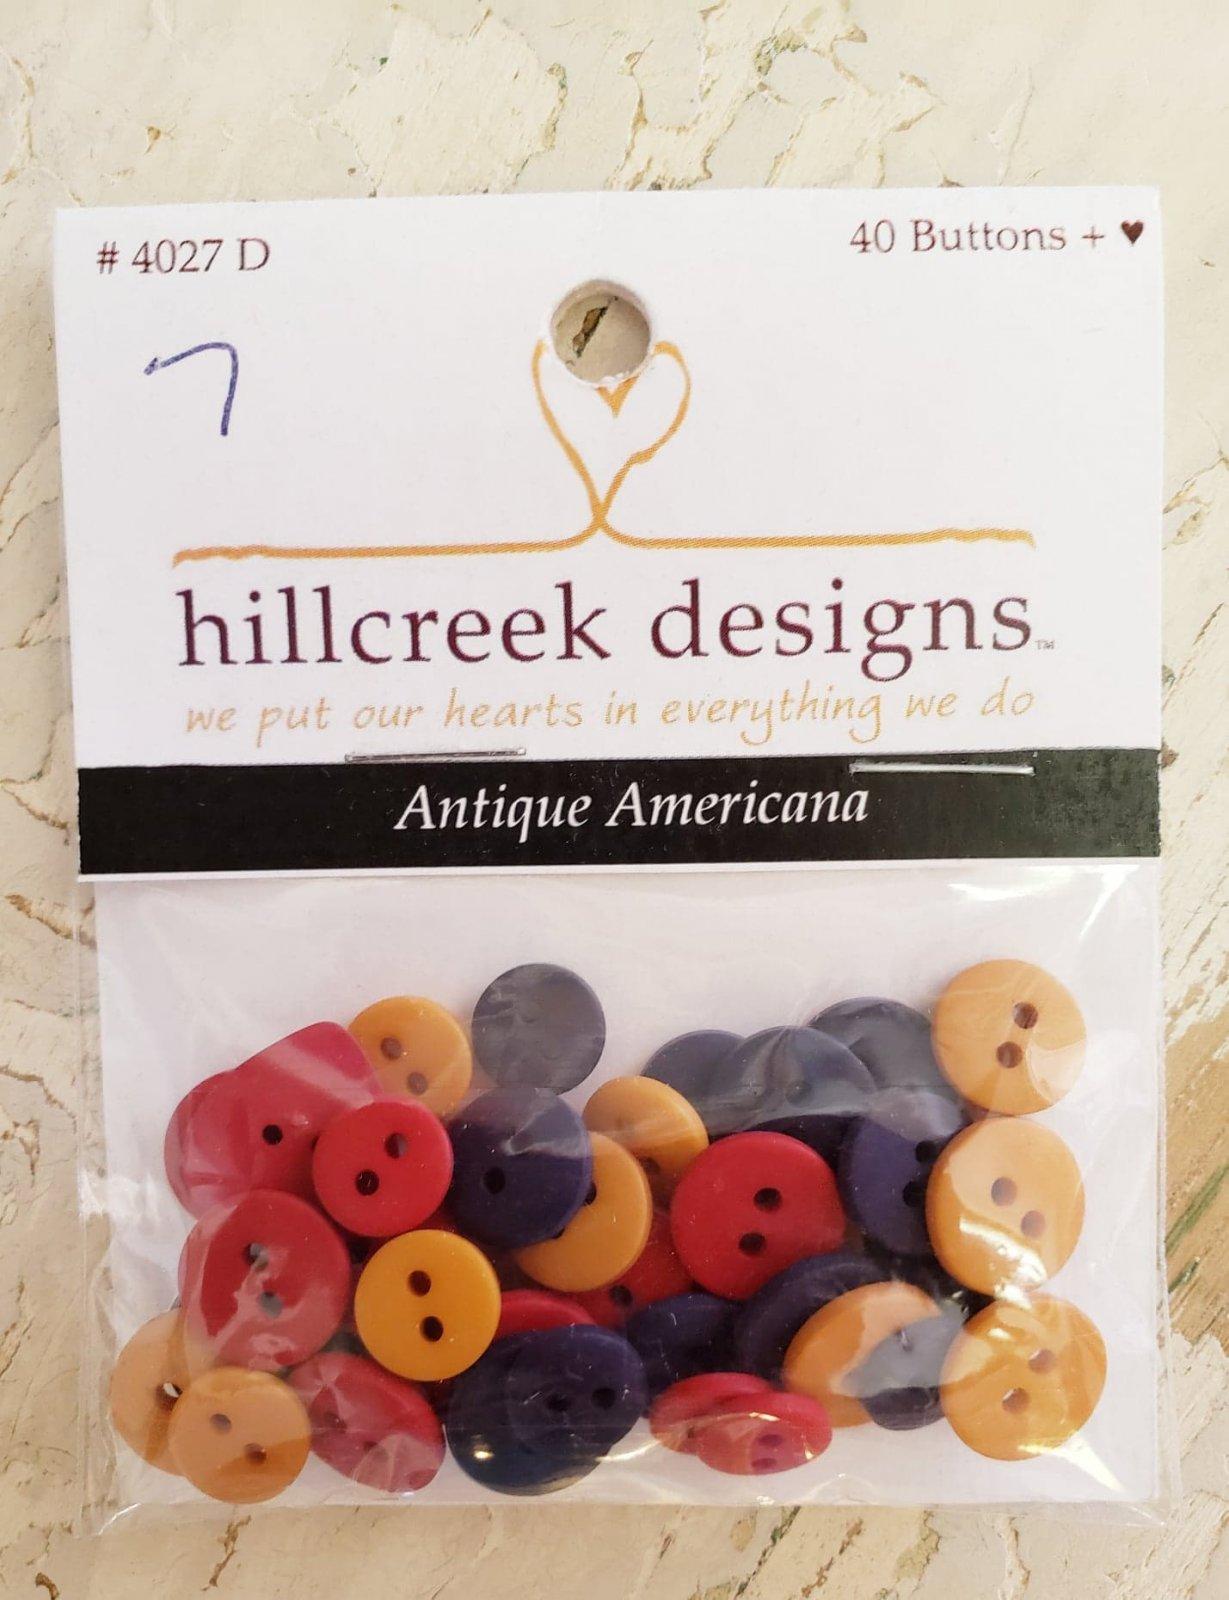 Buttons-Antique Americana